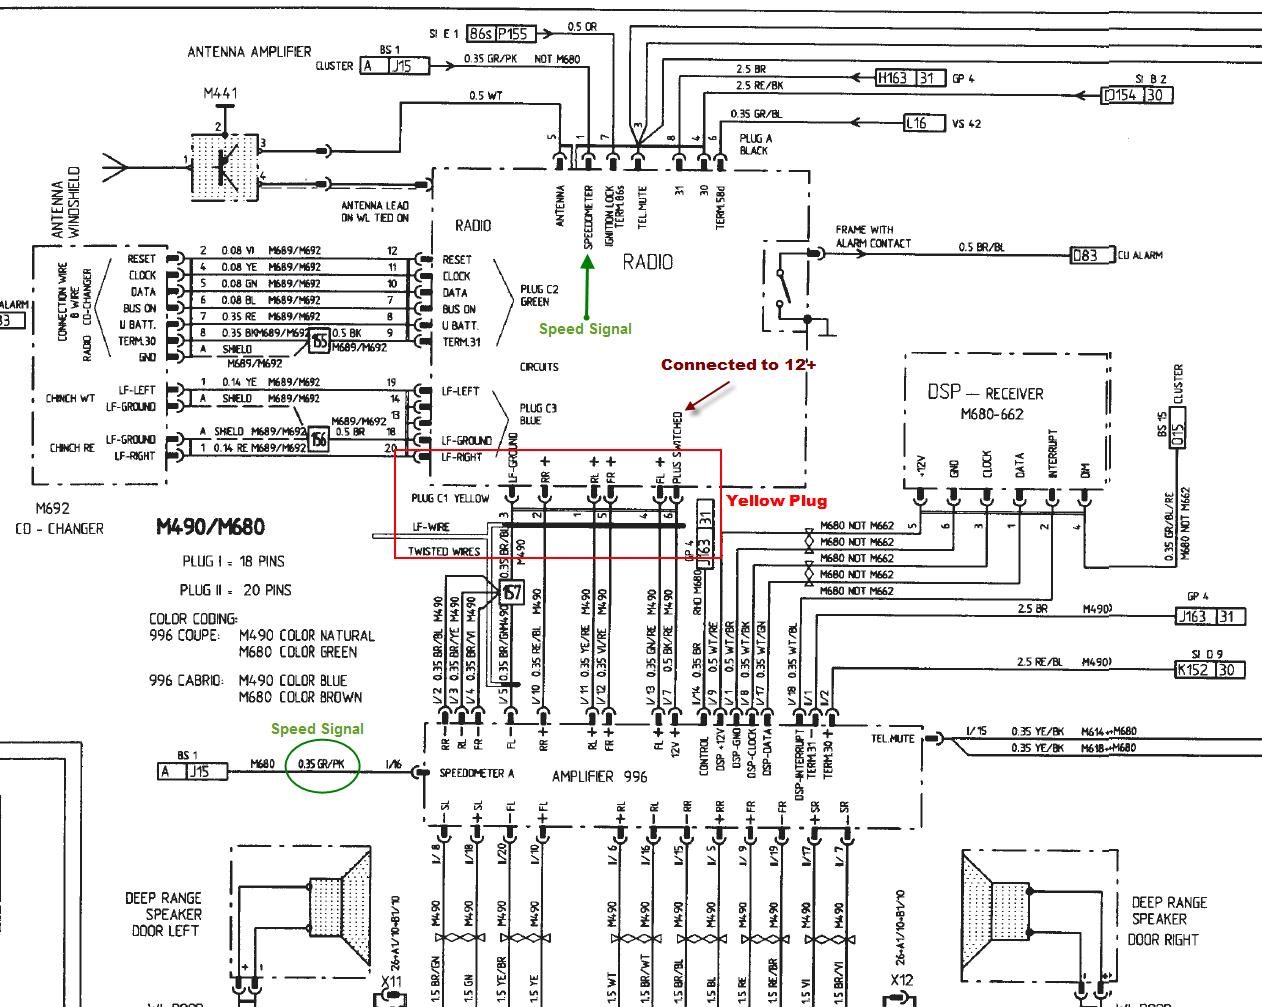 Land Rover Series 2a Wiring Diagram 35 Images 45 Diesel Diagrams 80 Radiowiring 5a64549eac81f27f3f250d4ad01b4bb18b4d62d3resize6652c531ssl